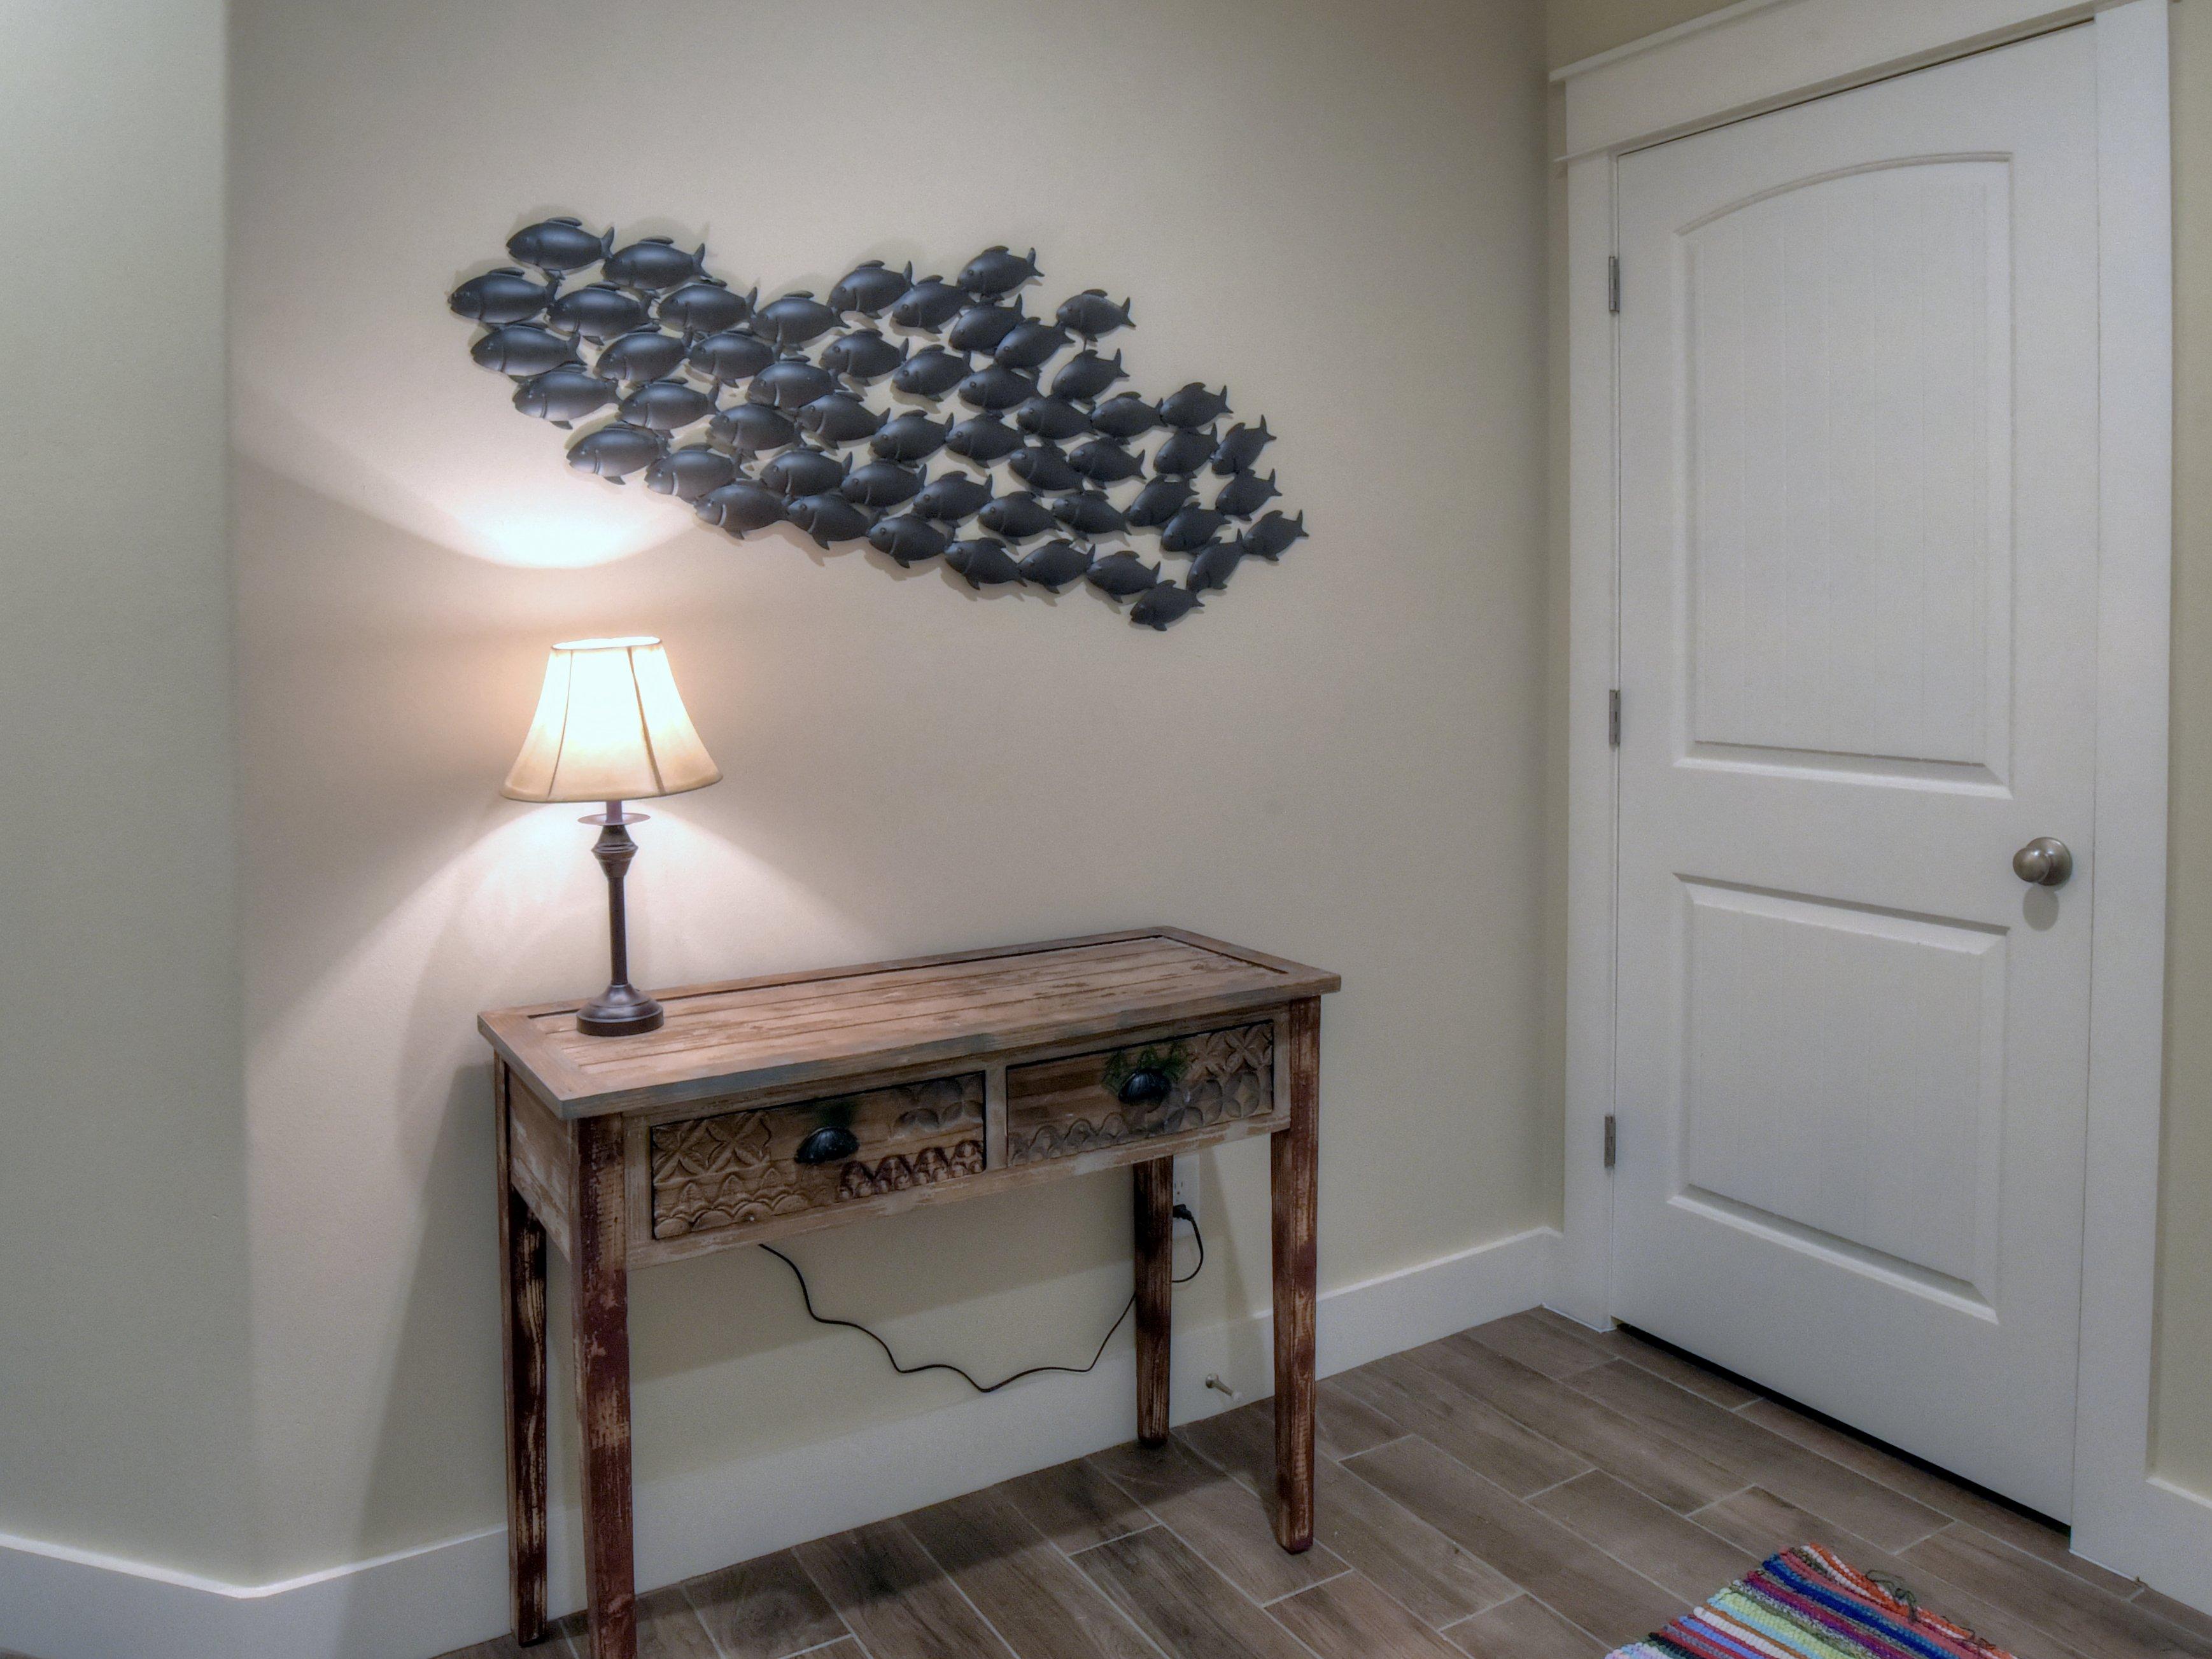 93 Beacon Point Condo rental in Sandestin Rentals ~ Cottages and Villas  in Destin Florida - #31